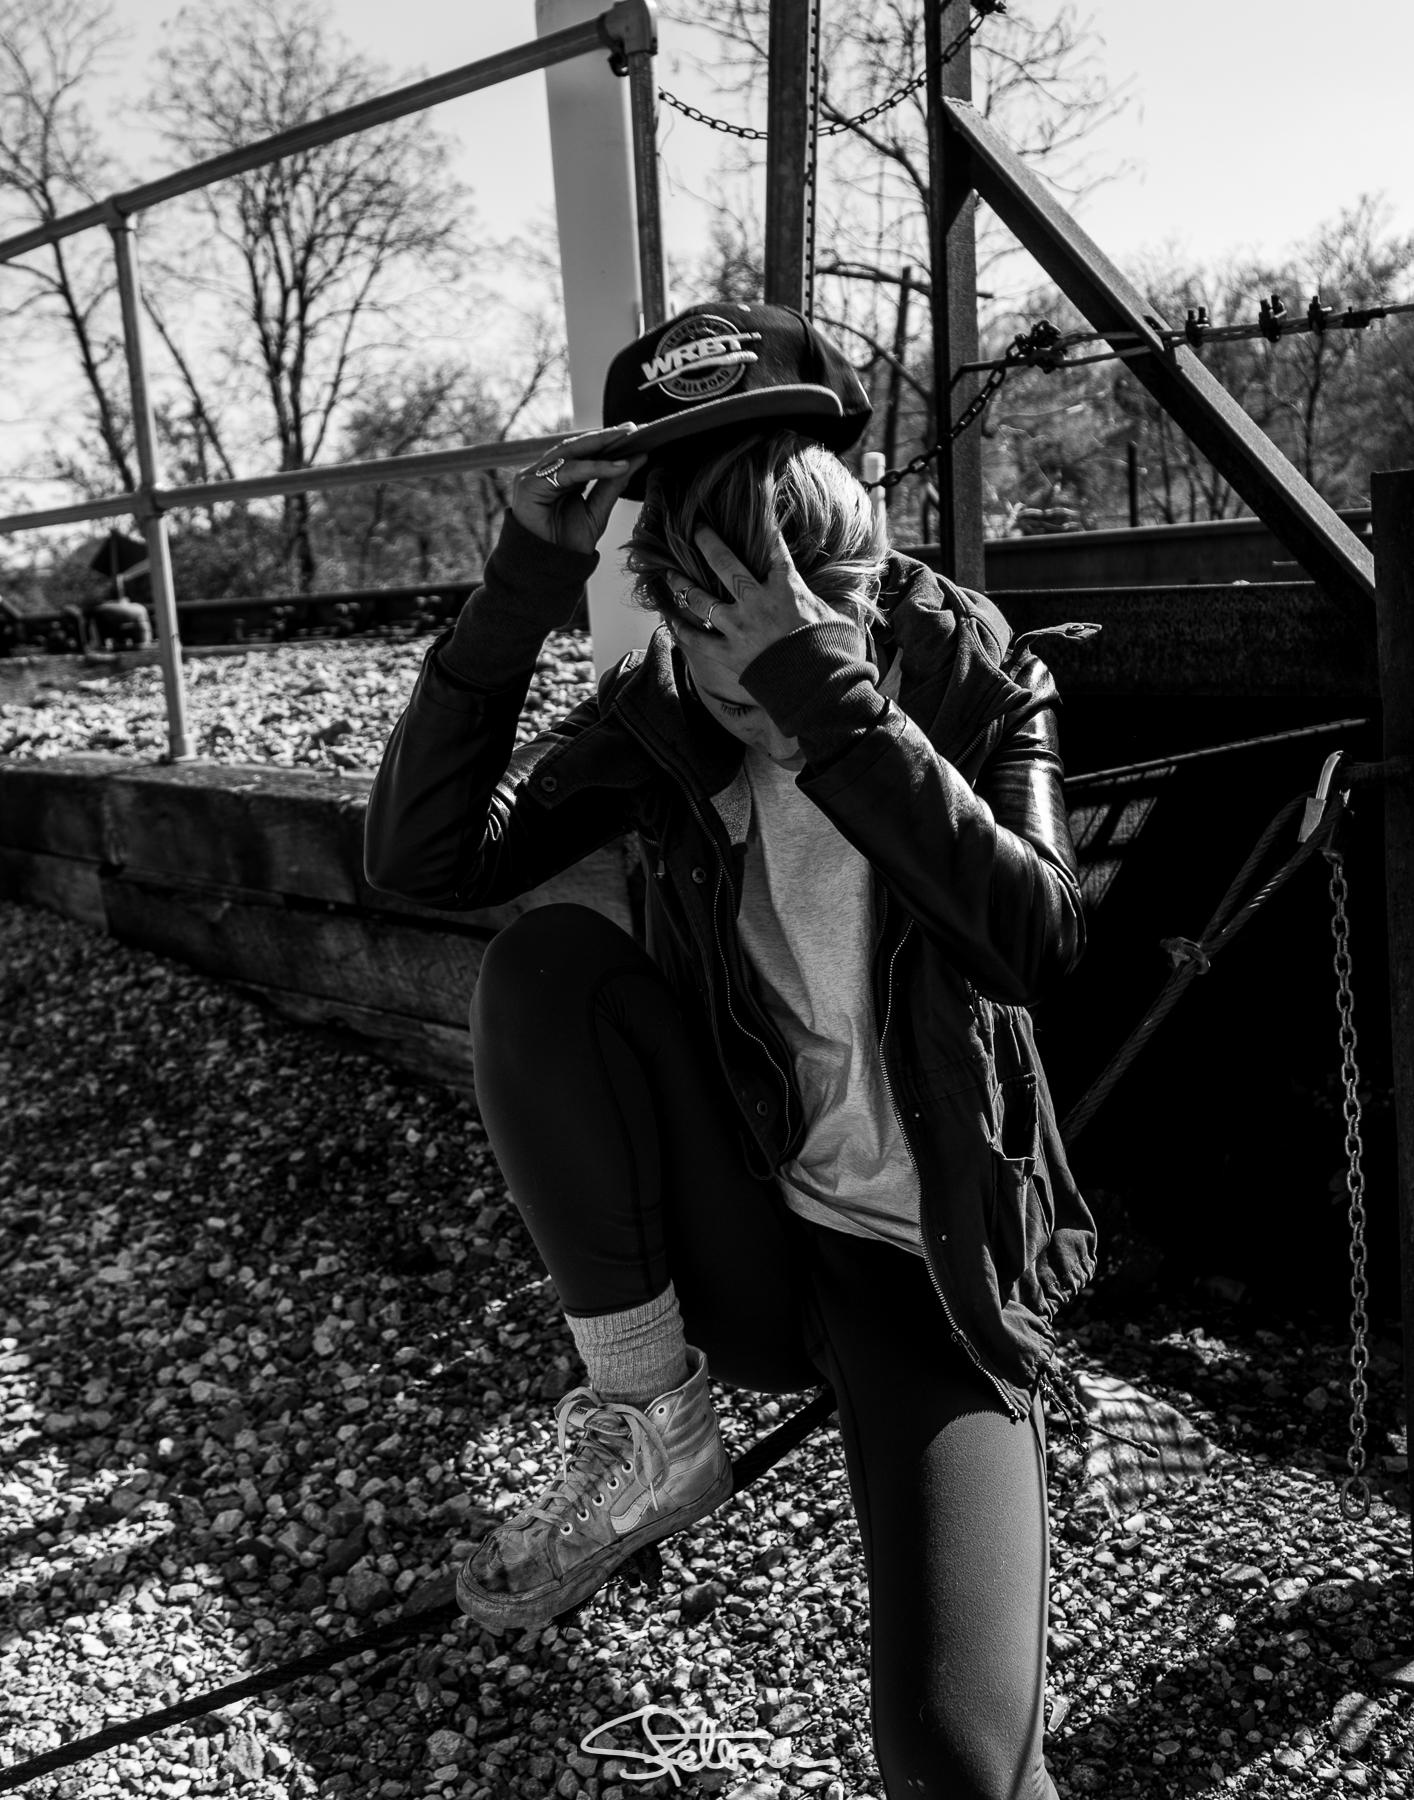 WRBT Railway | Rebekah Jarchow